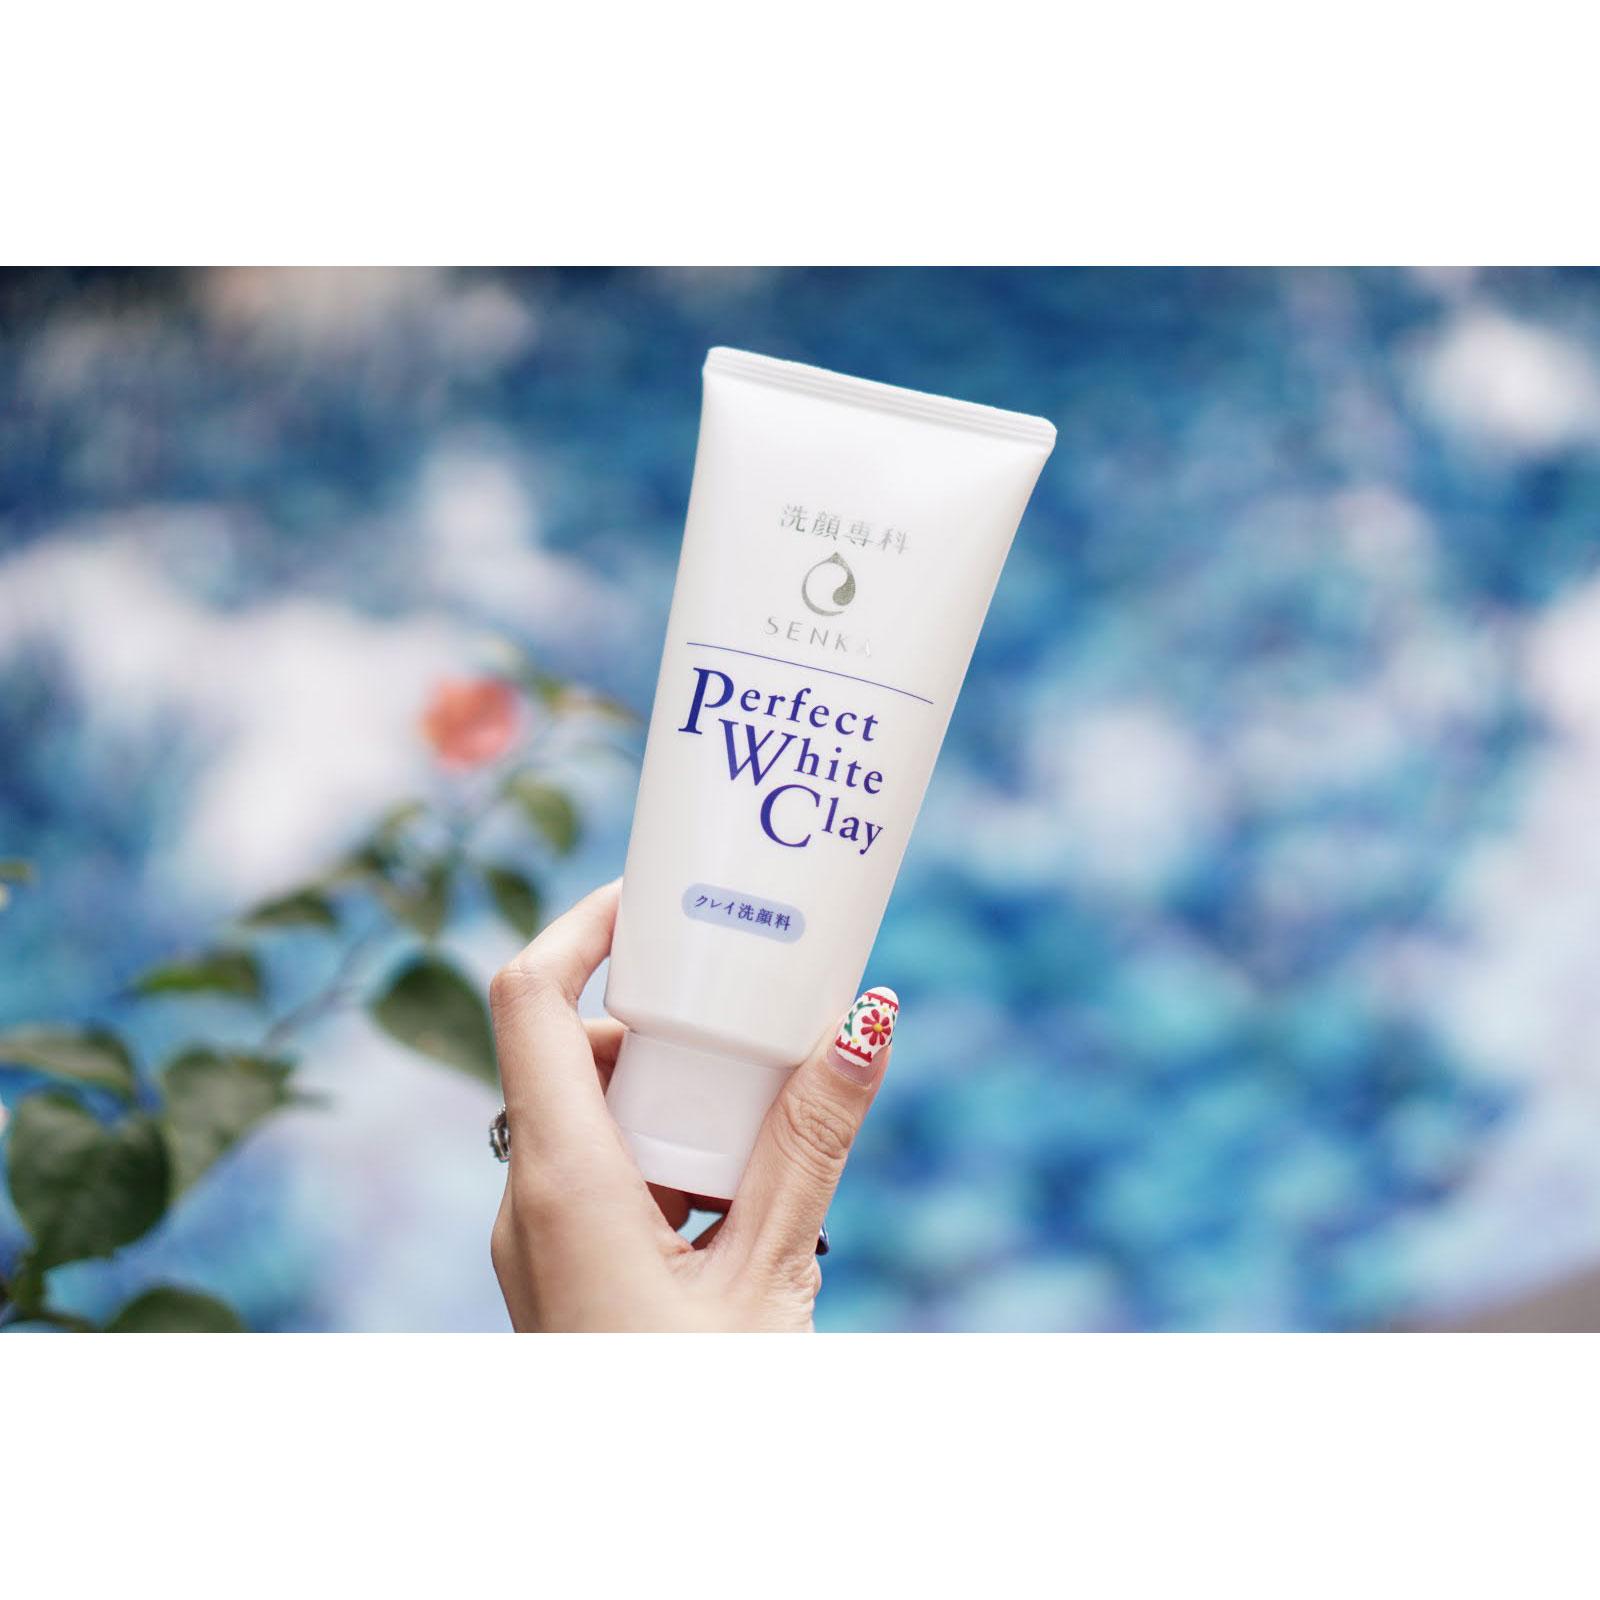 Shiseido Senka Perfect White Clay Facial Cleanser (120g)